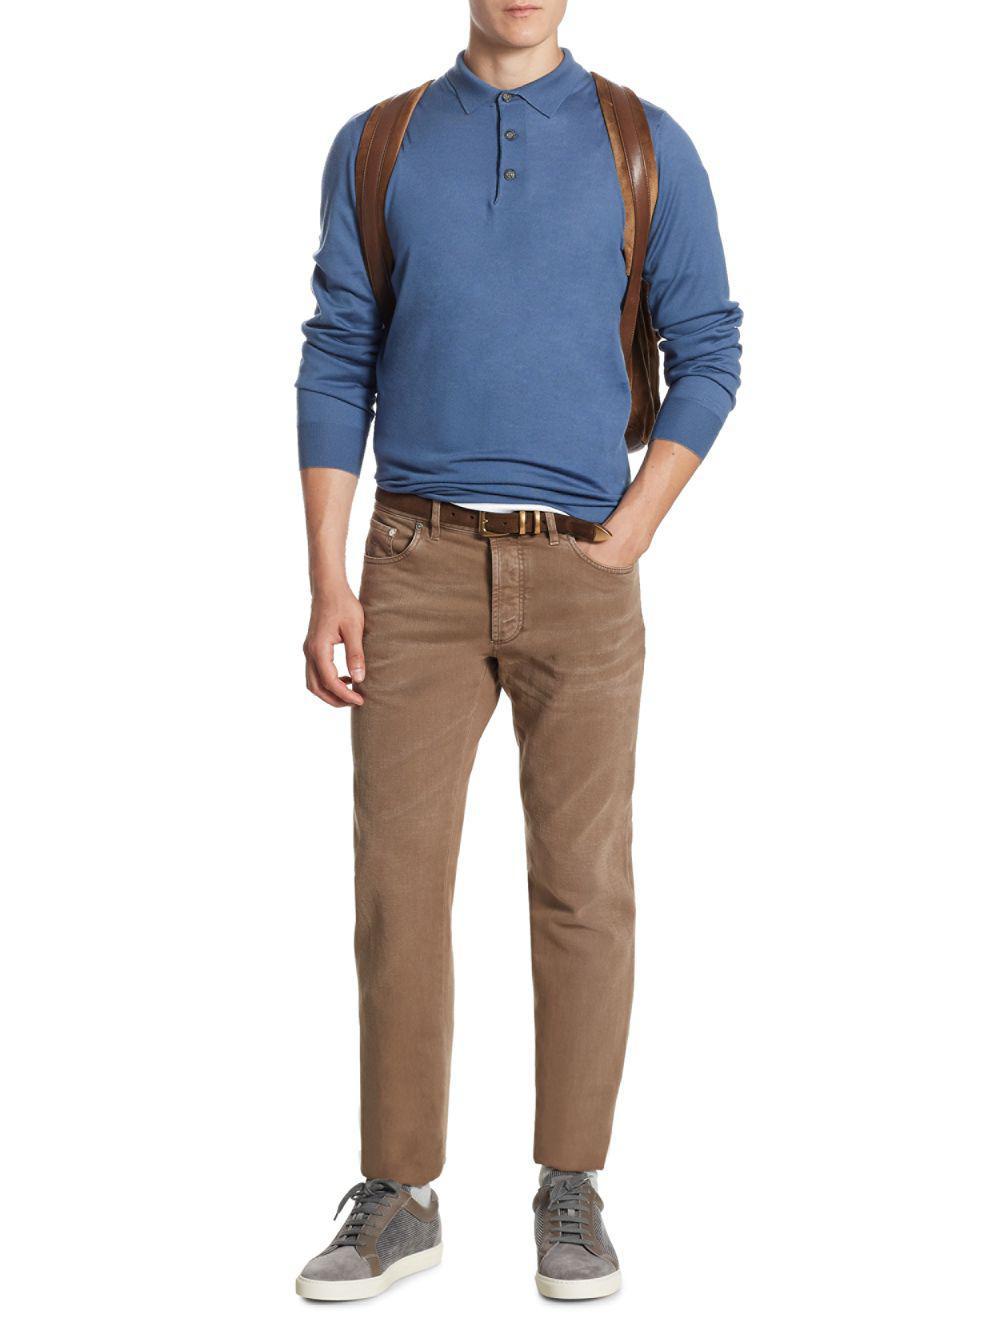 f9cd7229a7 Lyst - Brunello Cucinelli Cotton Polo Sweater in Blue for Men